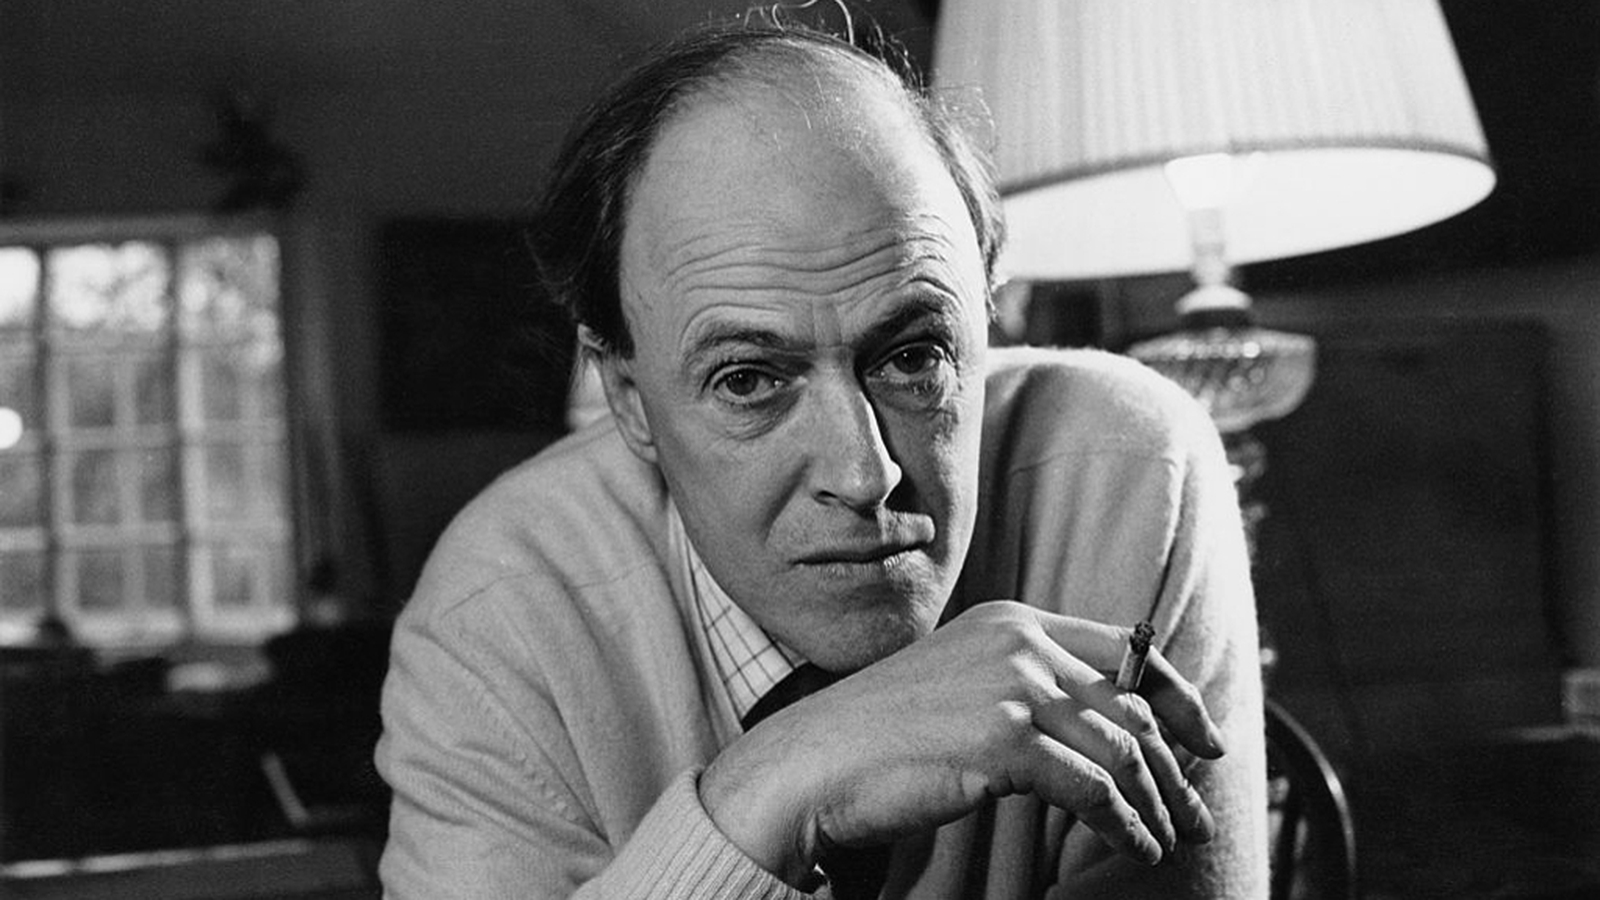 Netflix adapting Roald Dahl stories into TV shows